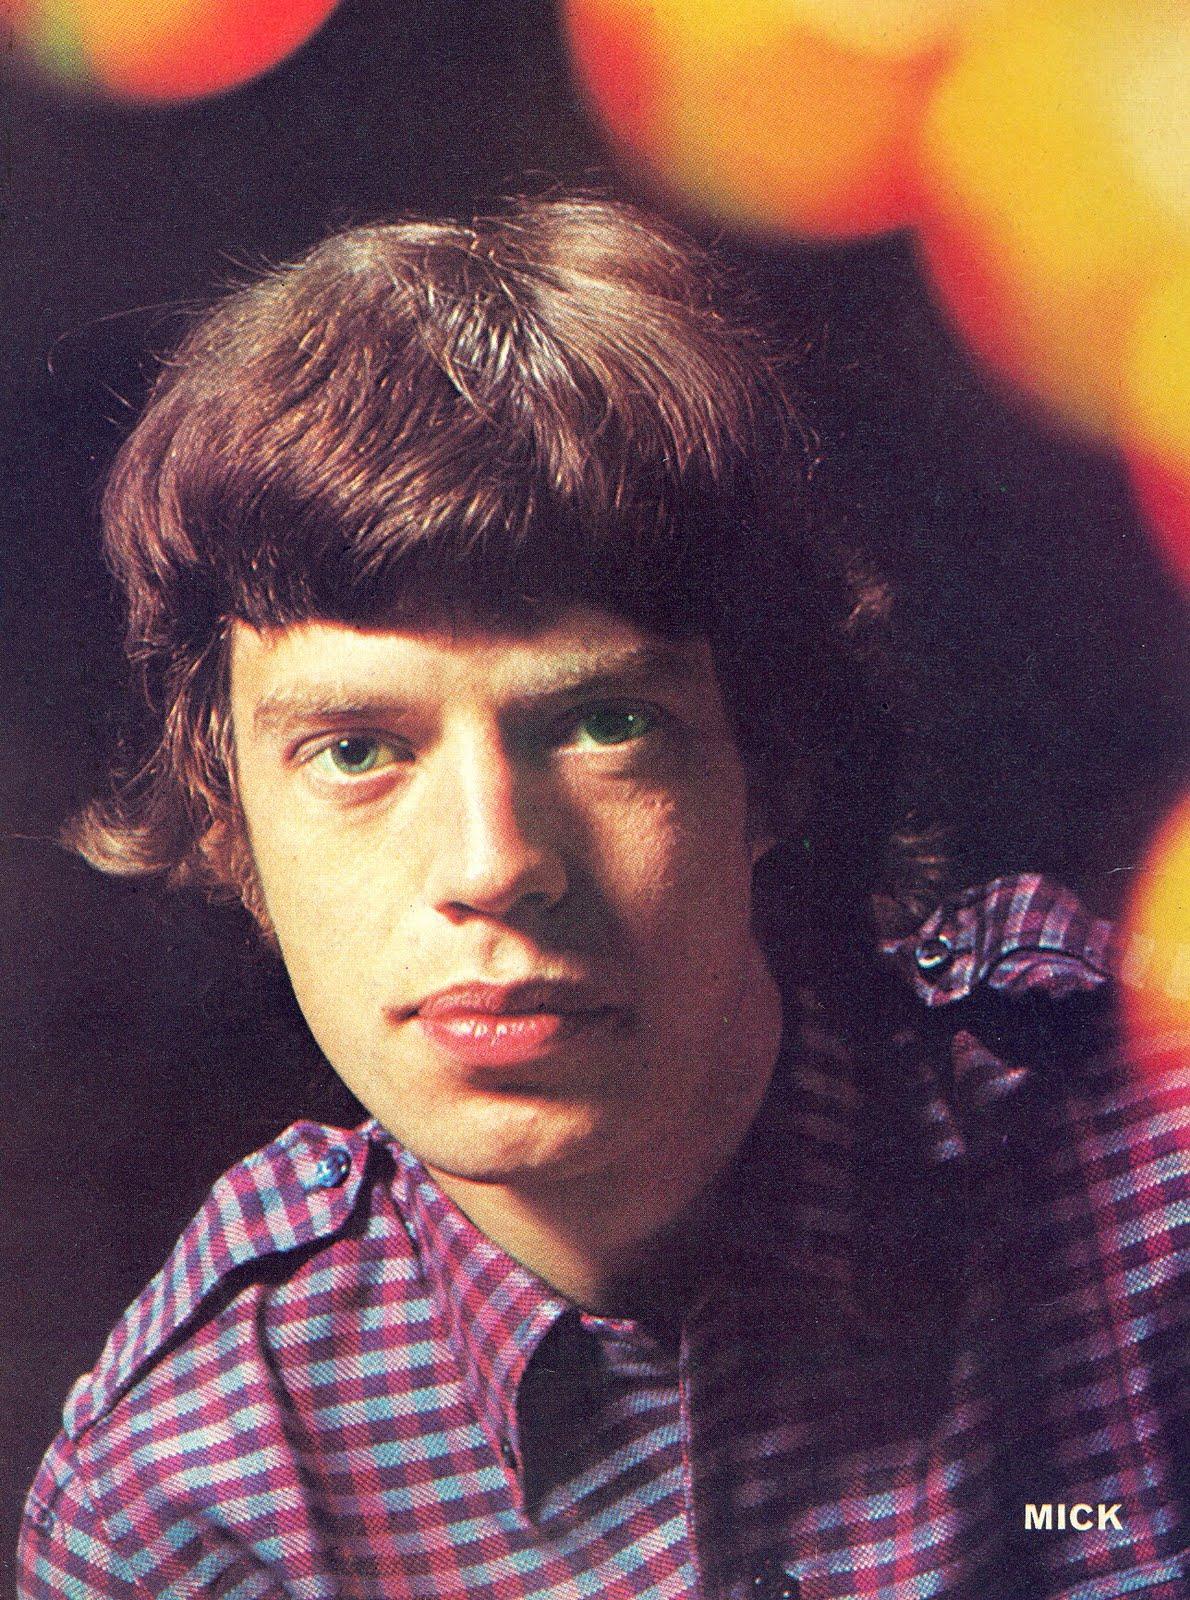 Sixties Beat Mick Jagger